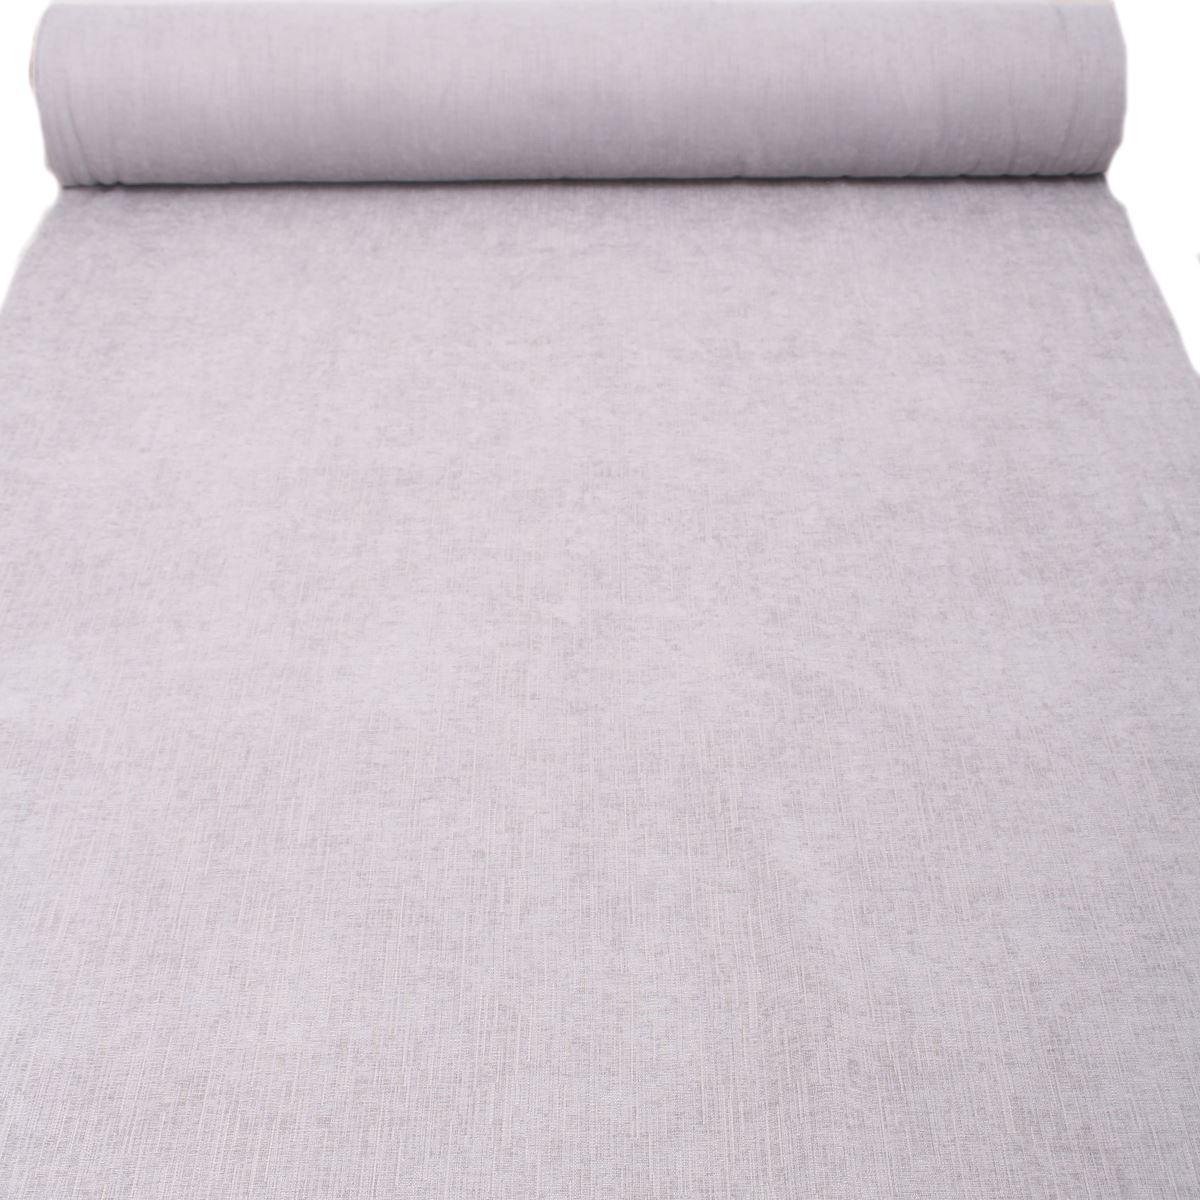 034-Chenille-034-Slubbed-Shabby-Worn-Look-Curtain-Cushion-Sofa-Upholstery-Fabric thumbnail 56